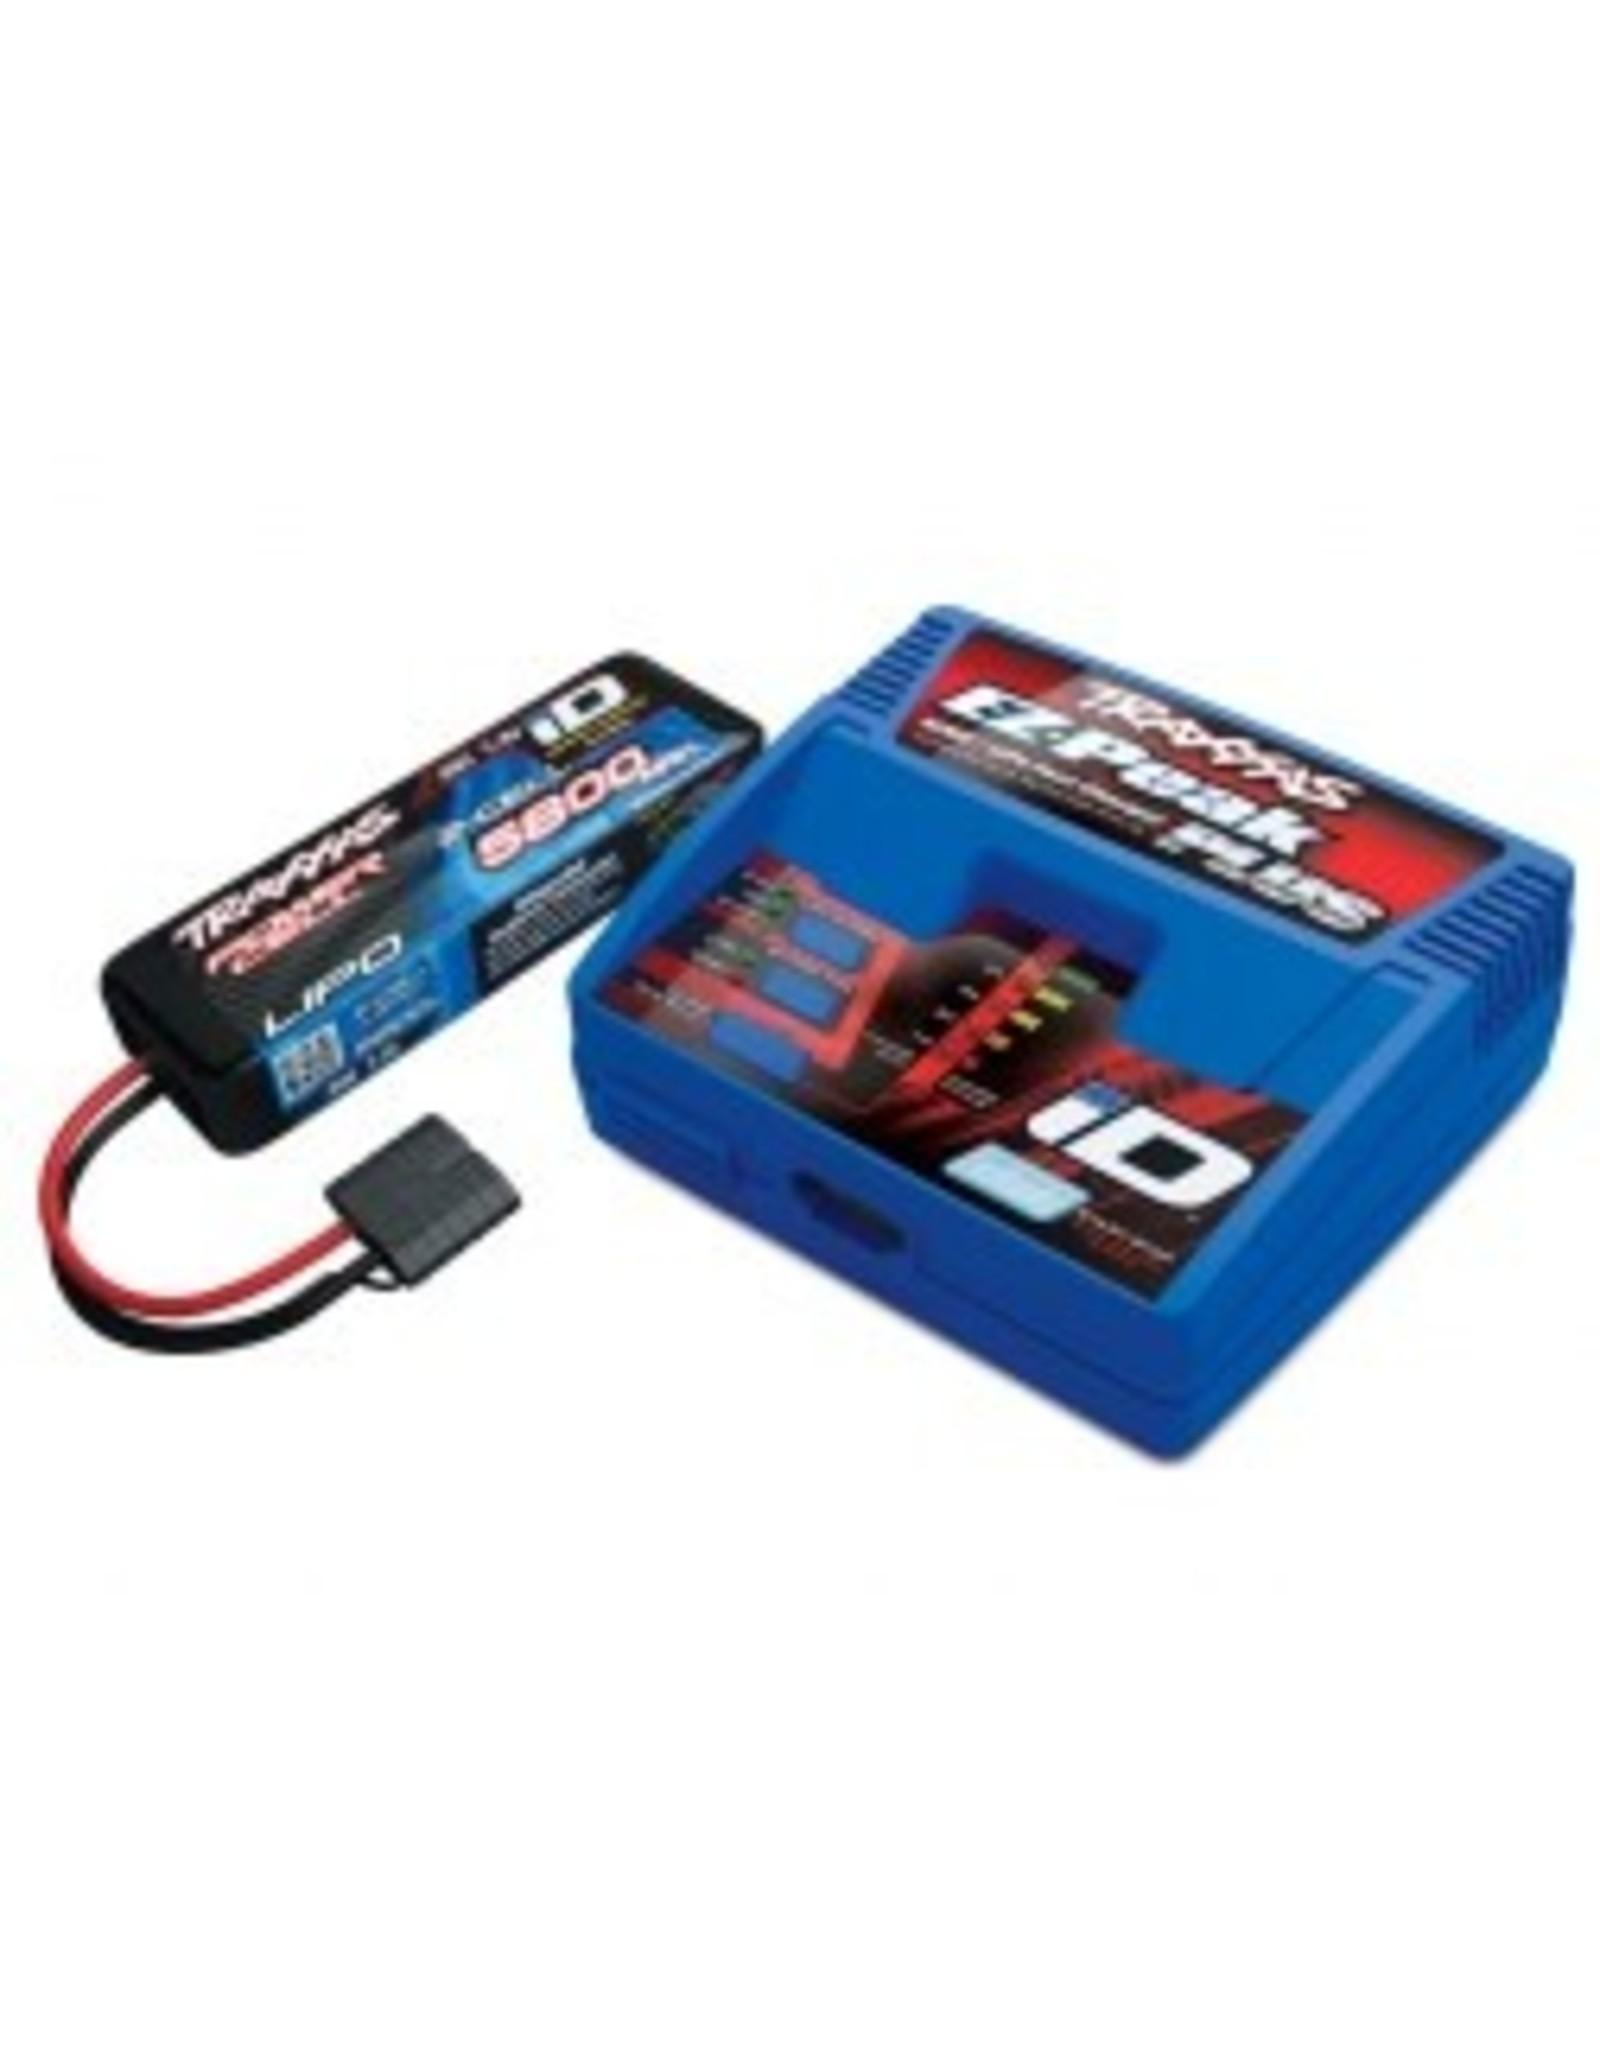 Traxxas 2S 5800mAh Single Completer Pack: (1) 7.4V 5800mAh LiPo Battery, (1) EZ-Peak Plus ID Charger(2992)